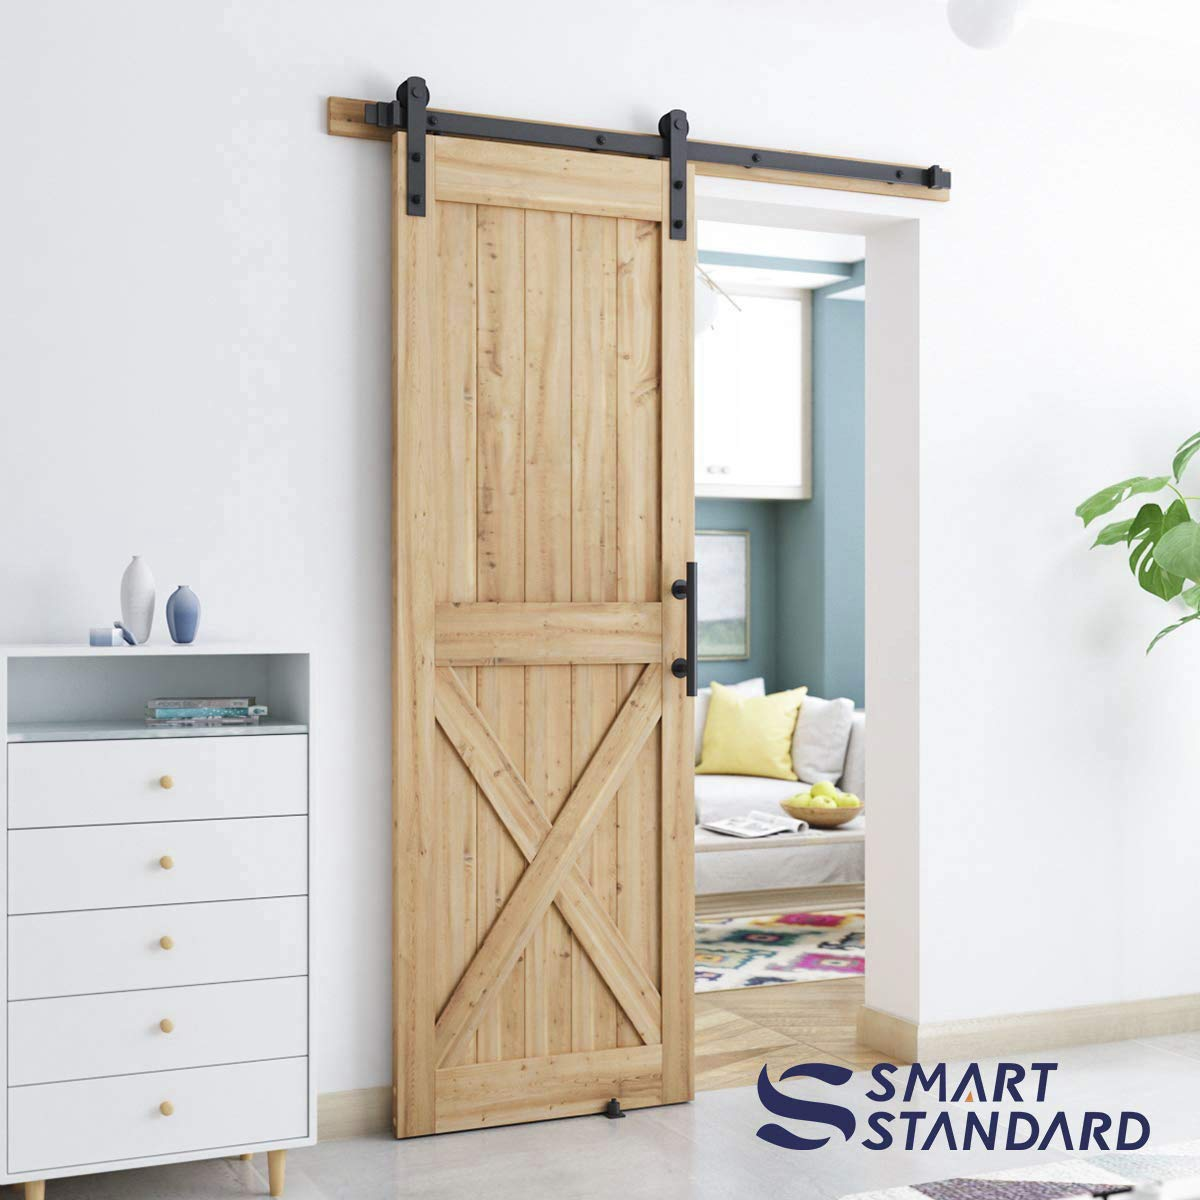 SmartStandard 30in x 84in Sliding Barn Wood Door Pre-Drilled Ready to Assemble Frameless K-Shape DIY Unfinished Solid Hemlock Wood Panelled Slab Natural Fit 5FT Rail Interior Single Door